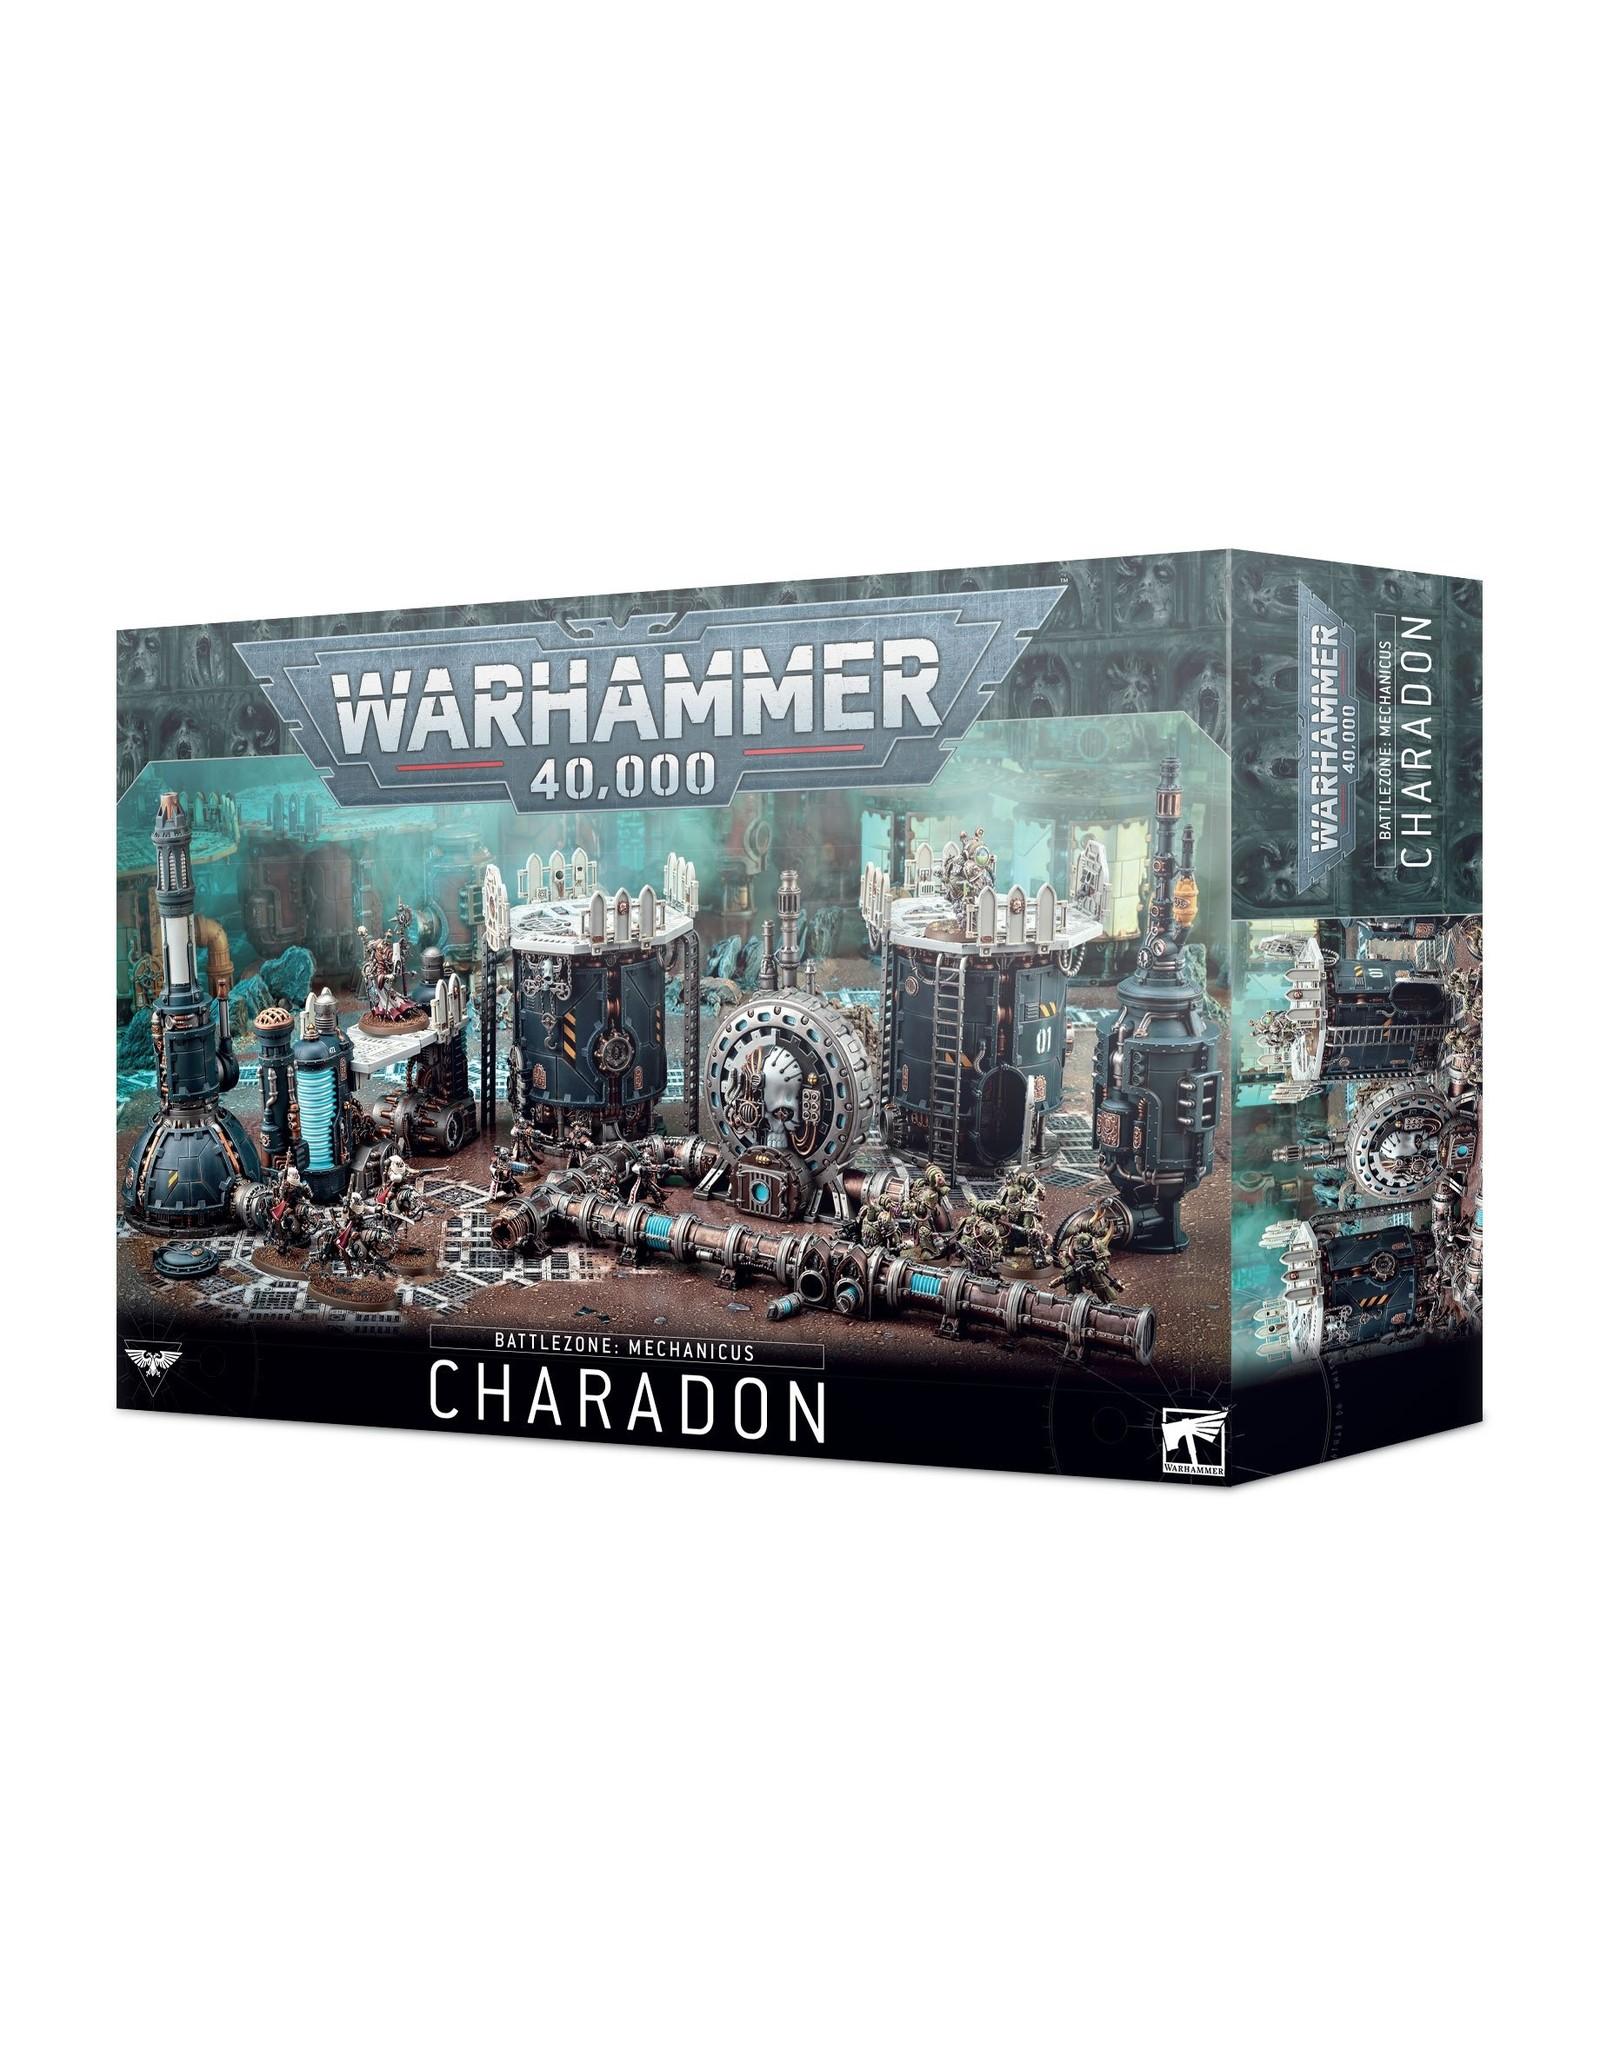 Warhammer 40K Battlezone: Mechanicus Charadon